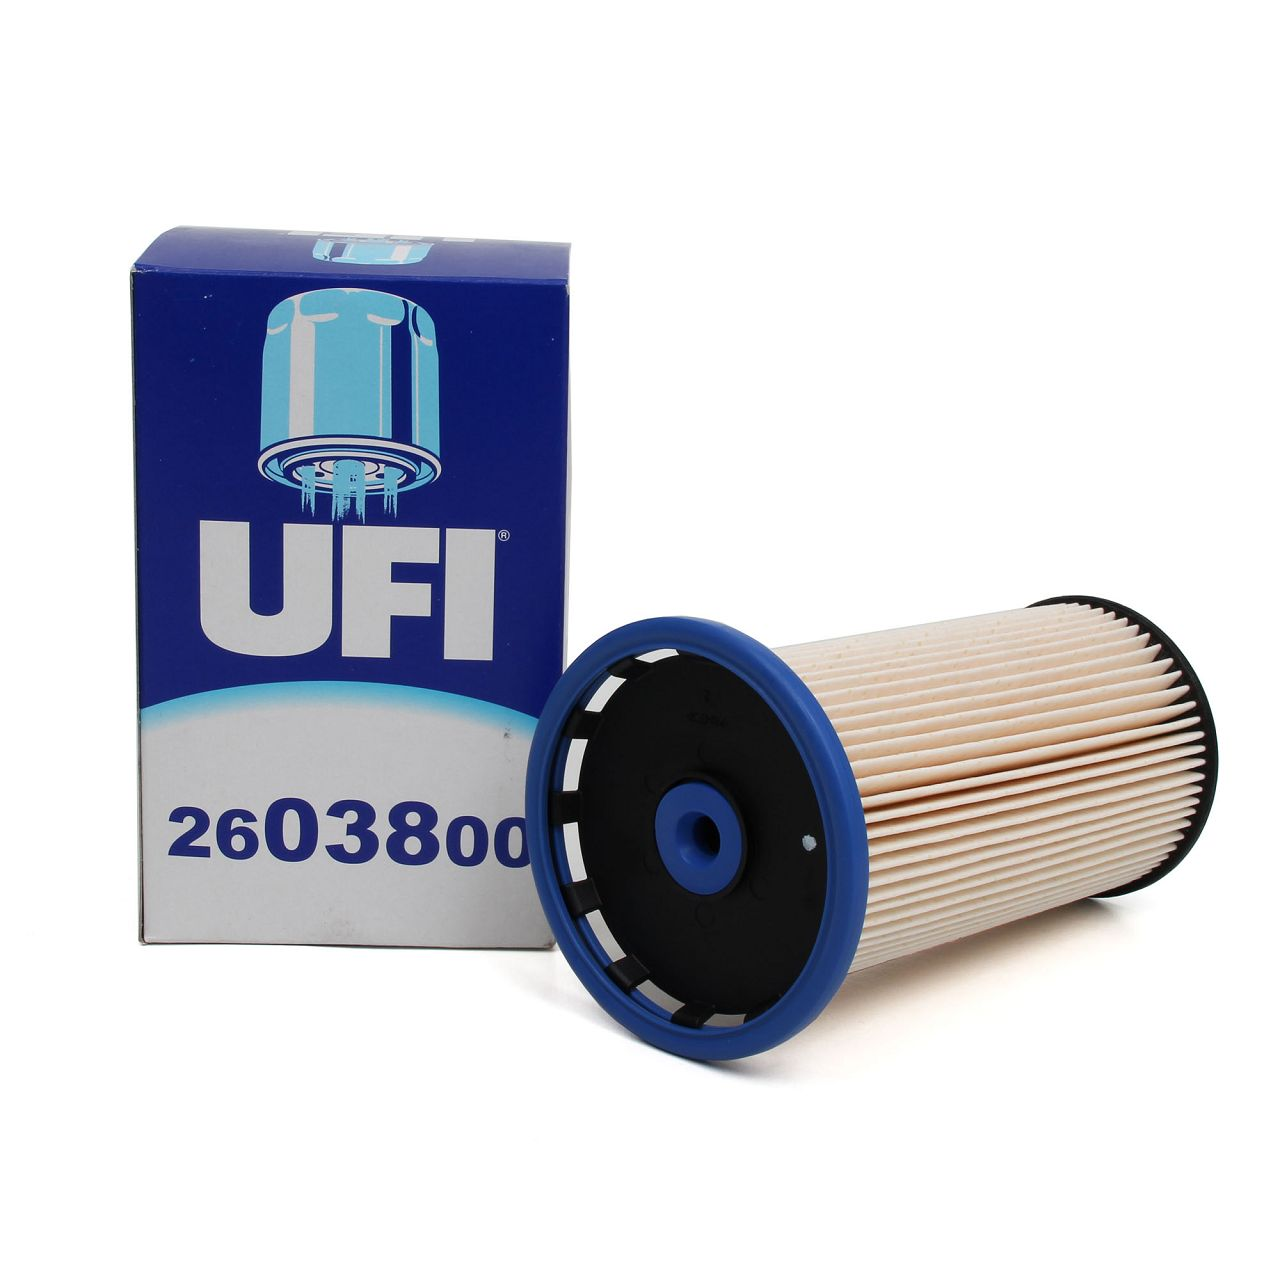 UFI Kraftstofffilter Dieselfilter für AUDI A3 SKODA VW GOLF 7 PASSAT 1.6 2.0TDI